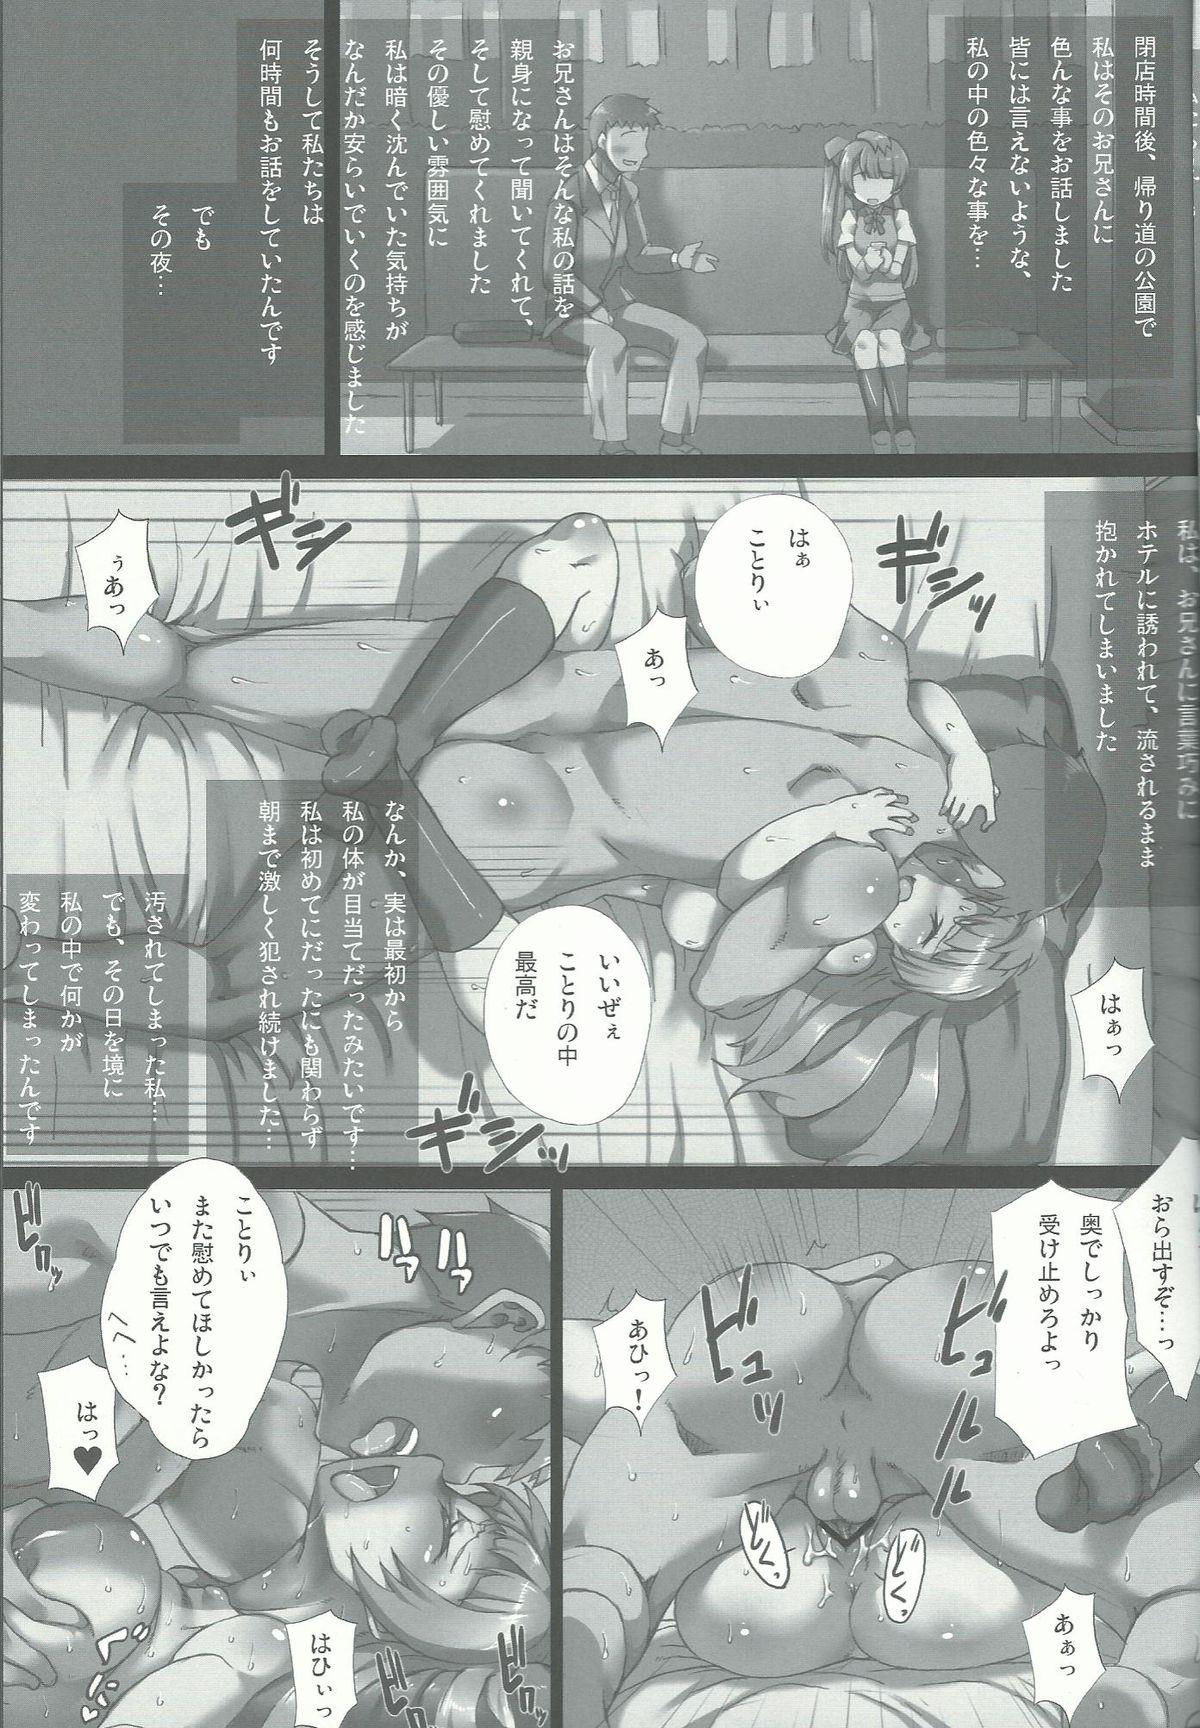 Kotori-chan de YanYan Suru Hon 5